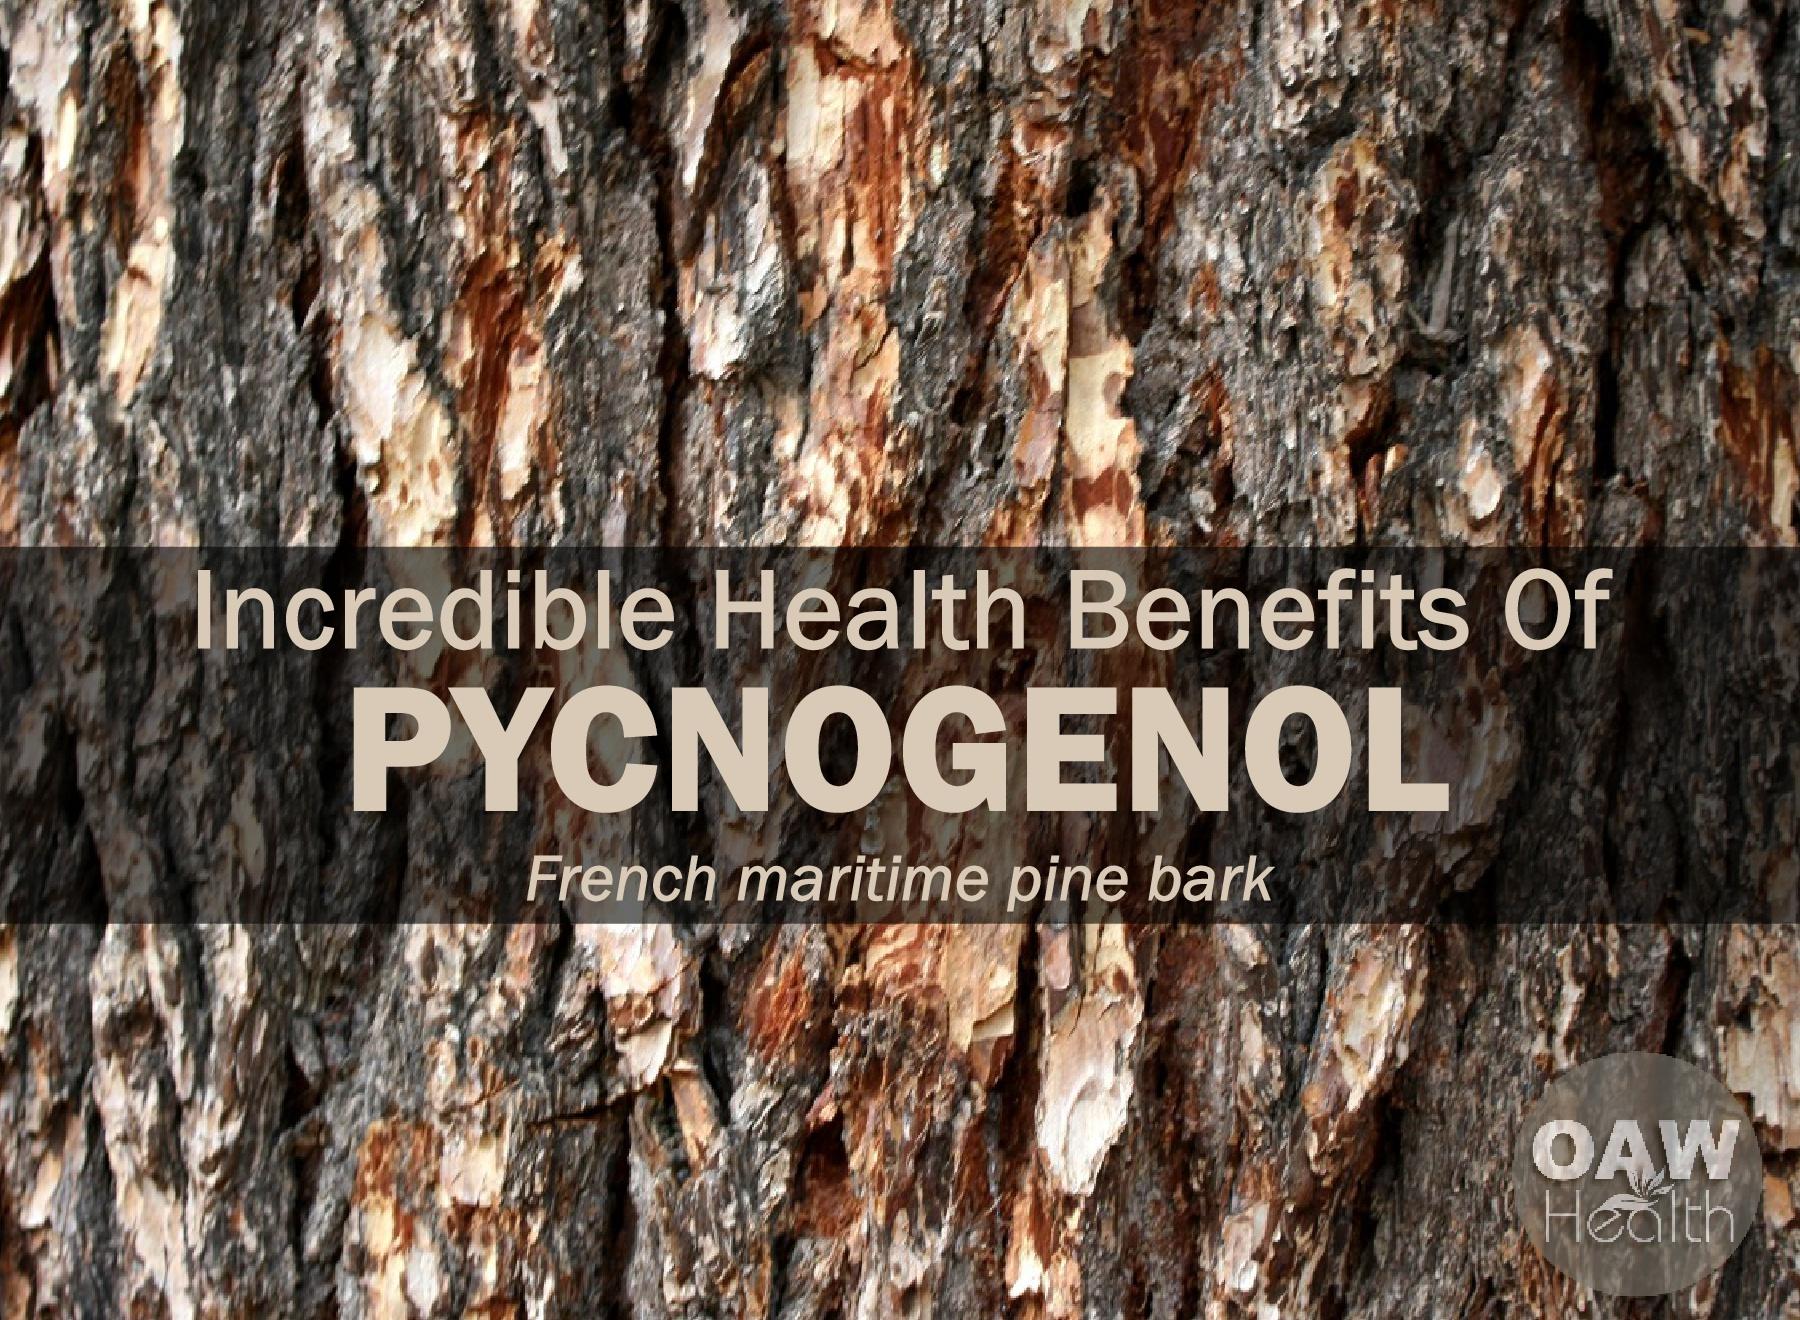 Pycnogenol – Incredible Health Benefits